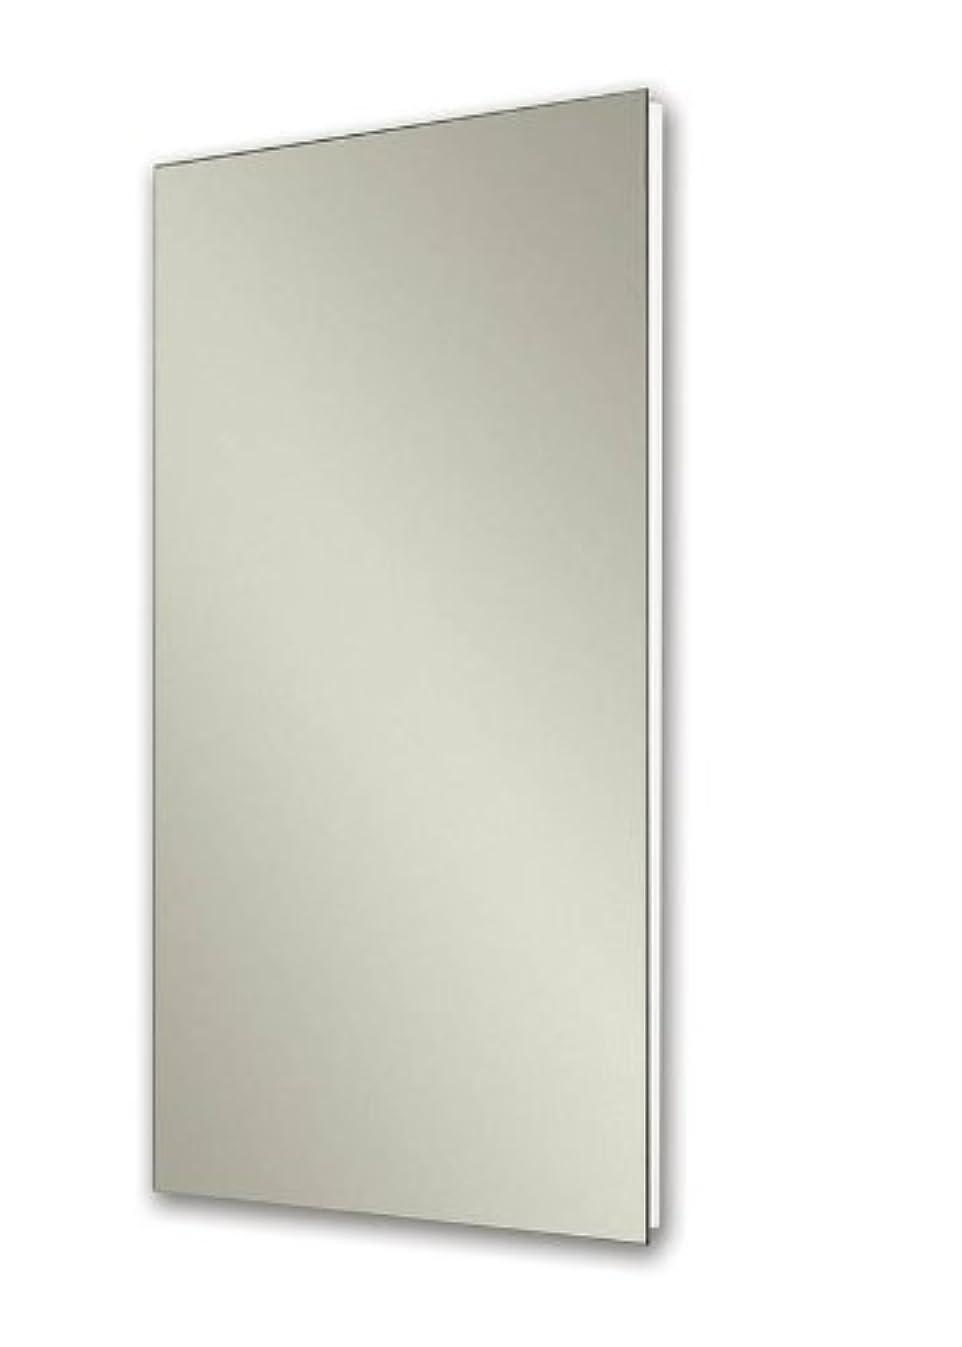 Jensen 1035P24WHG Cove Single-Door Recessed Mount Frameless Medicine Cabinet, 14 by 24-Inch